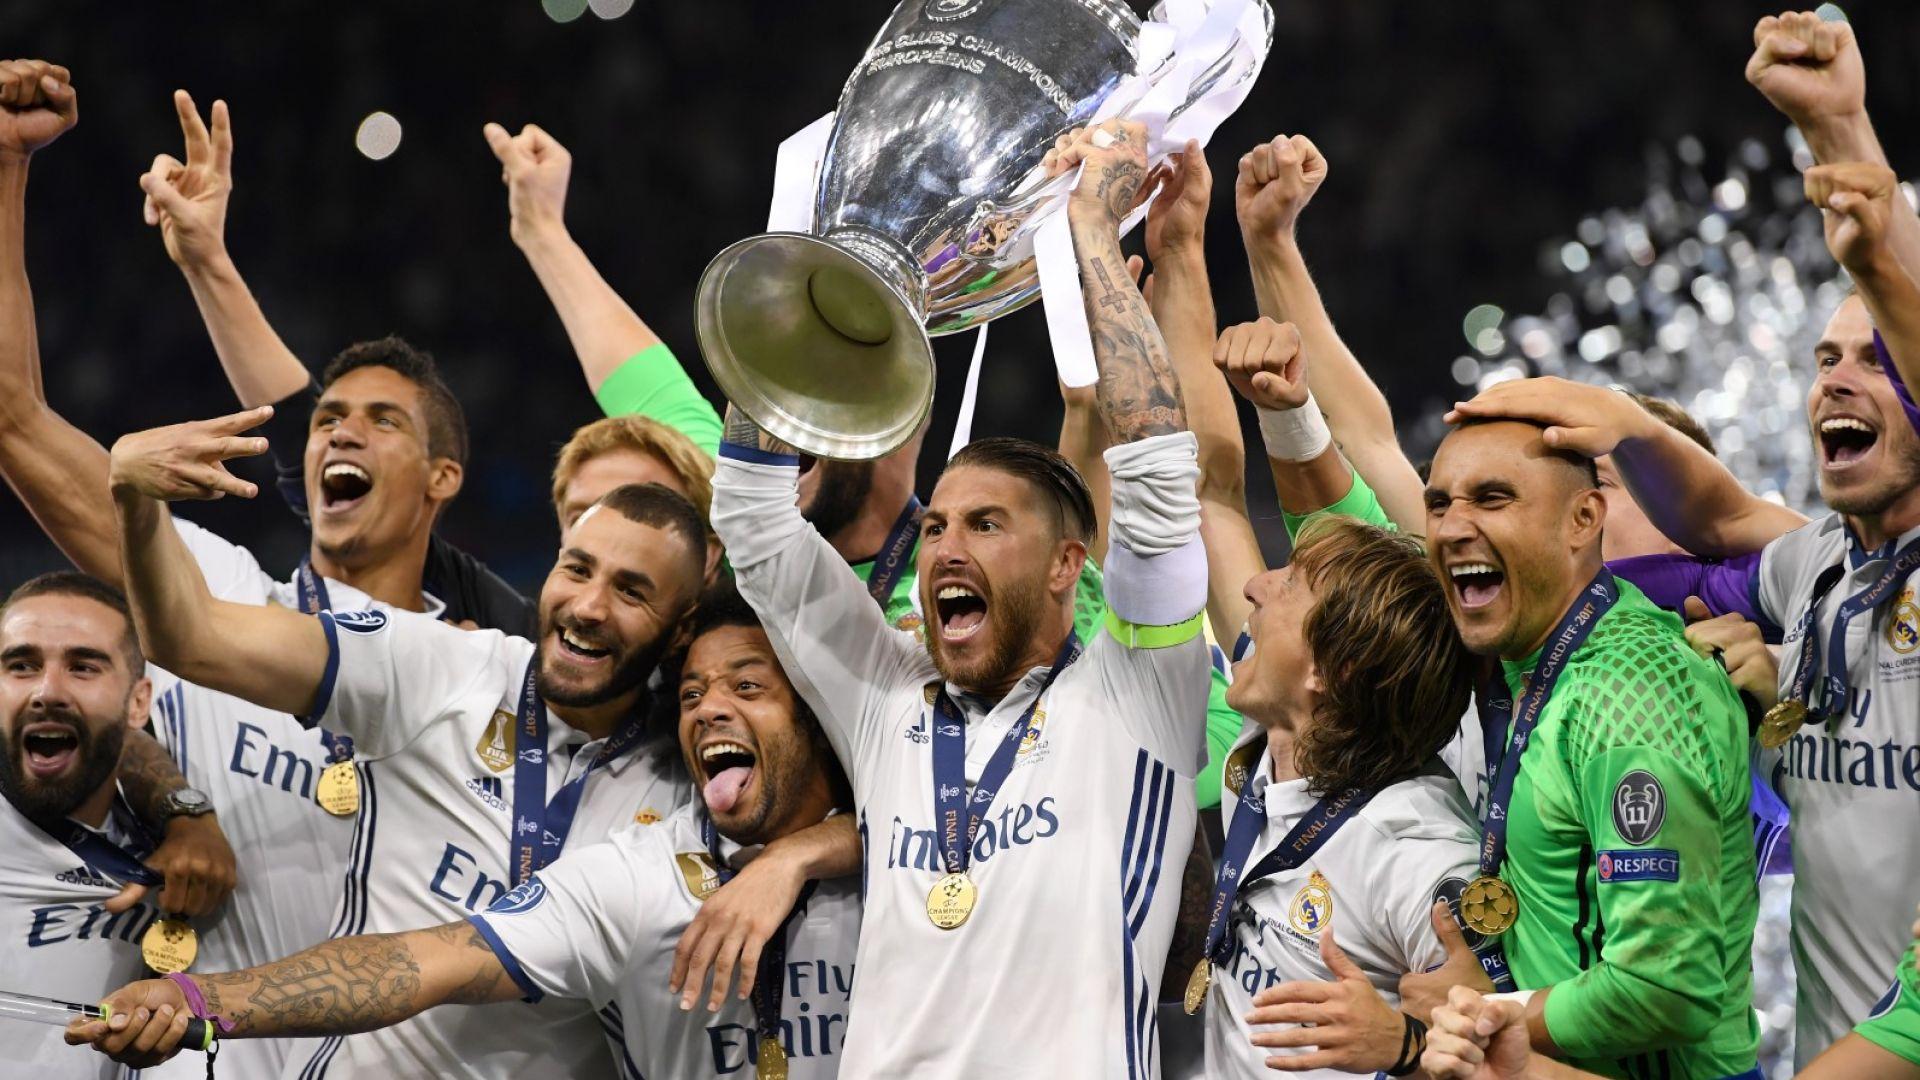 Флорентино Перес подготвя чистка на суперзвезди в Реал